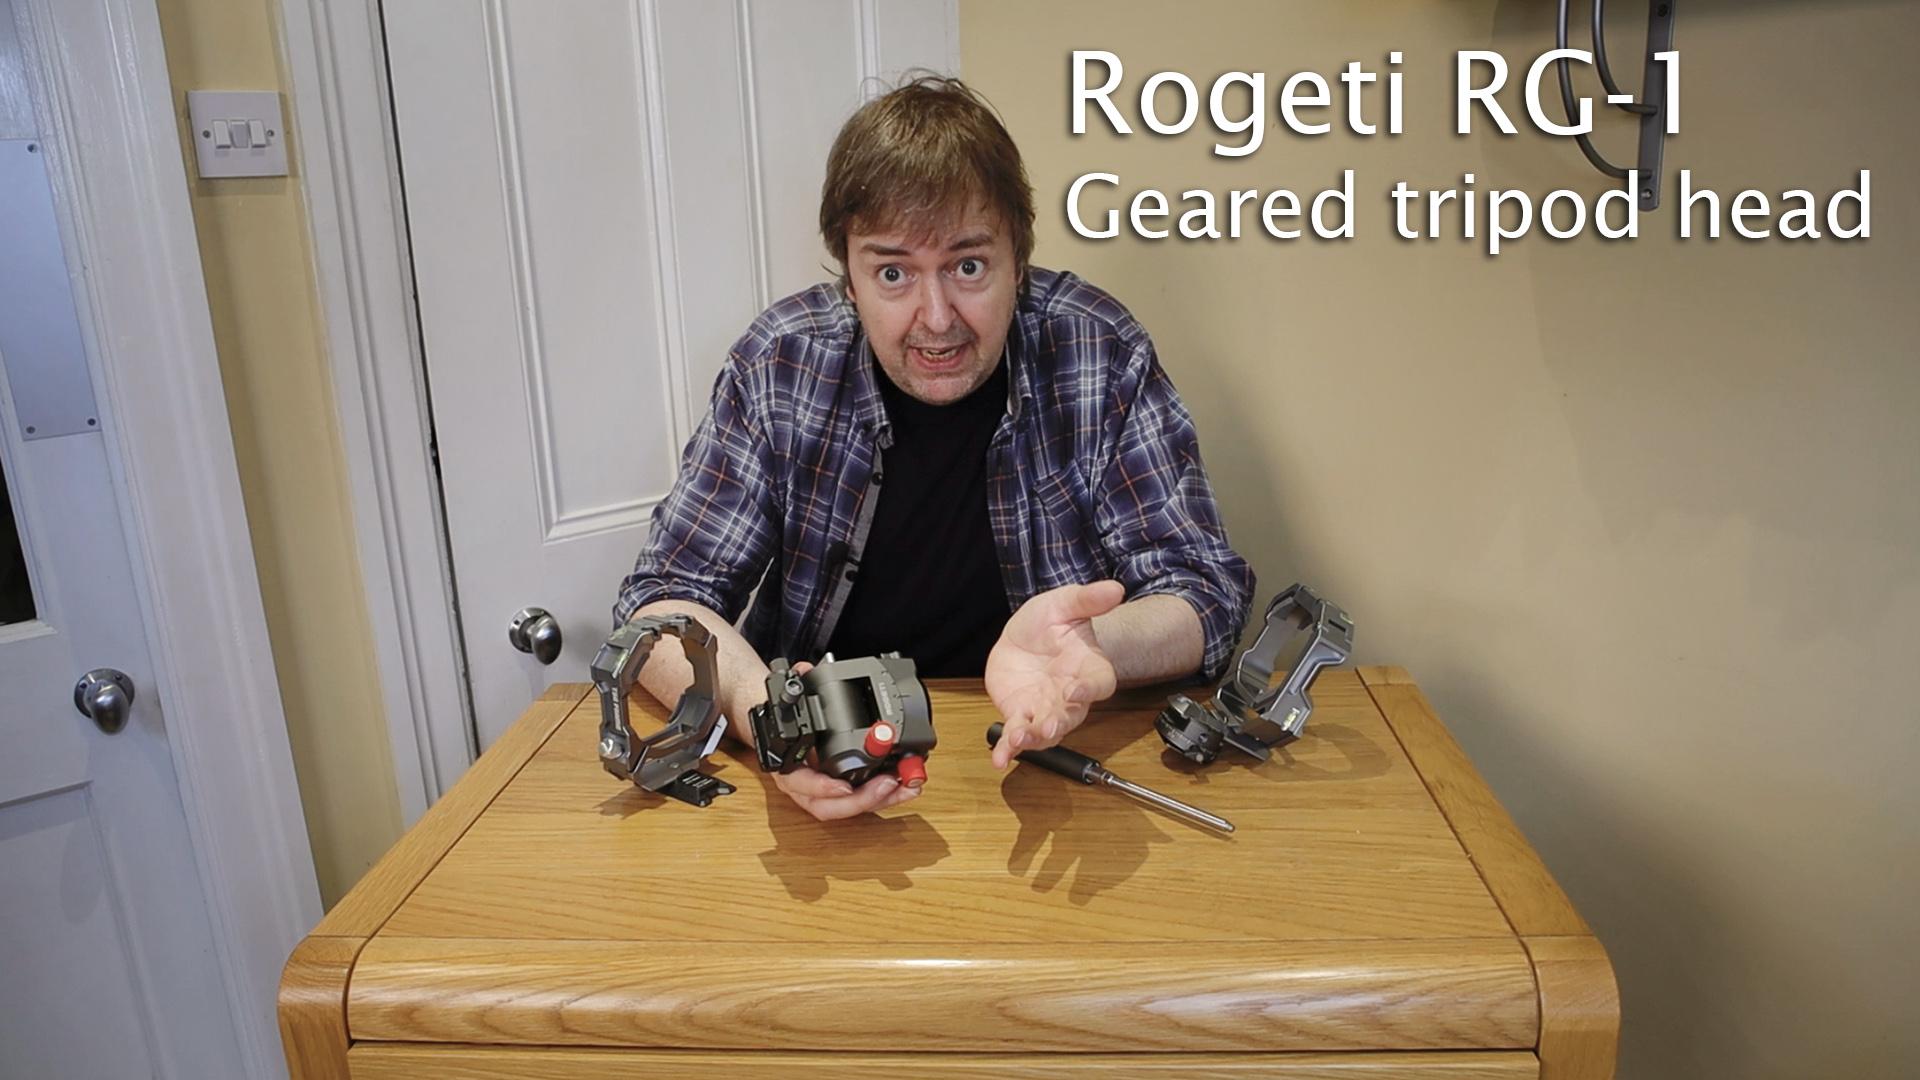 Rogeti RG-1 video